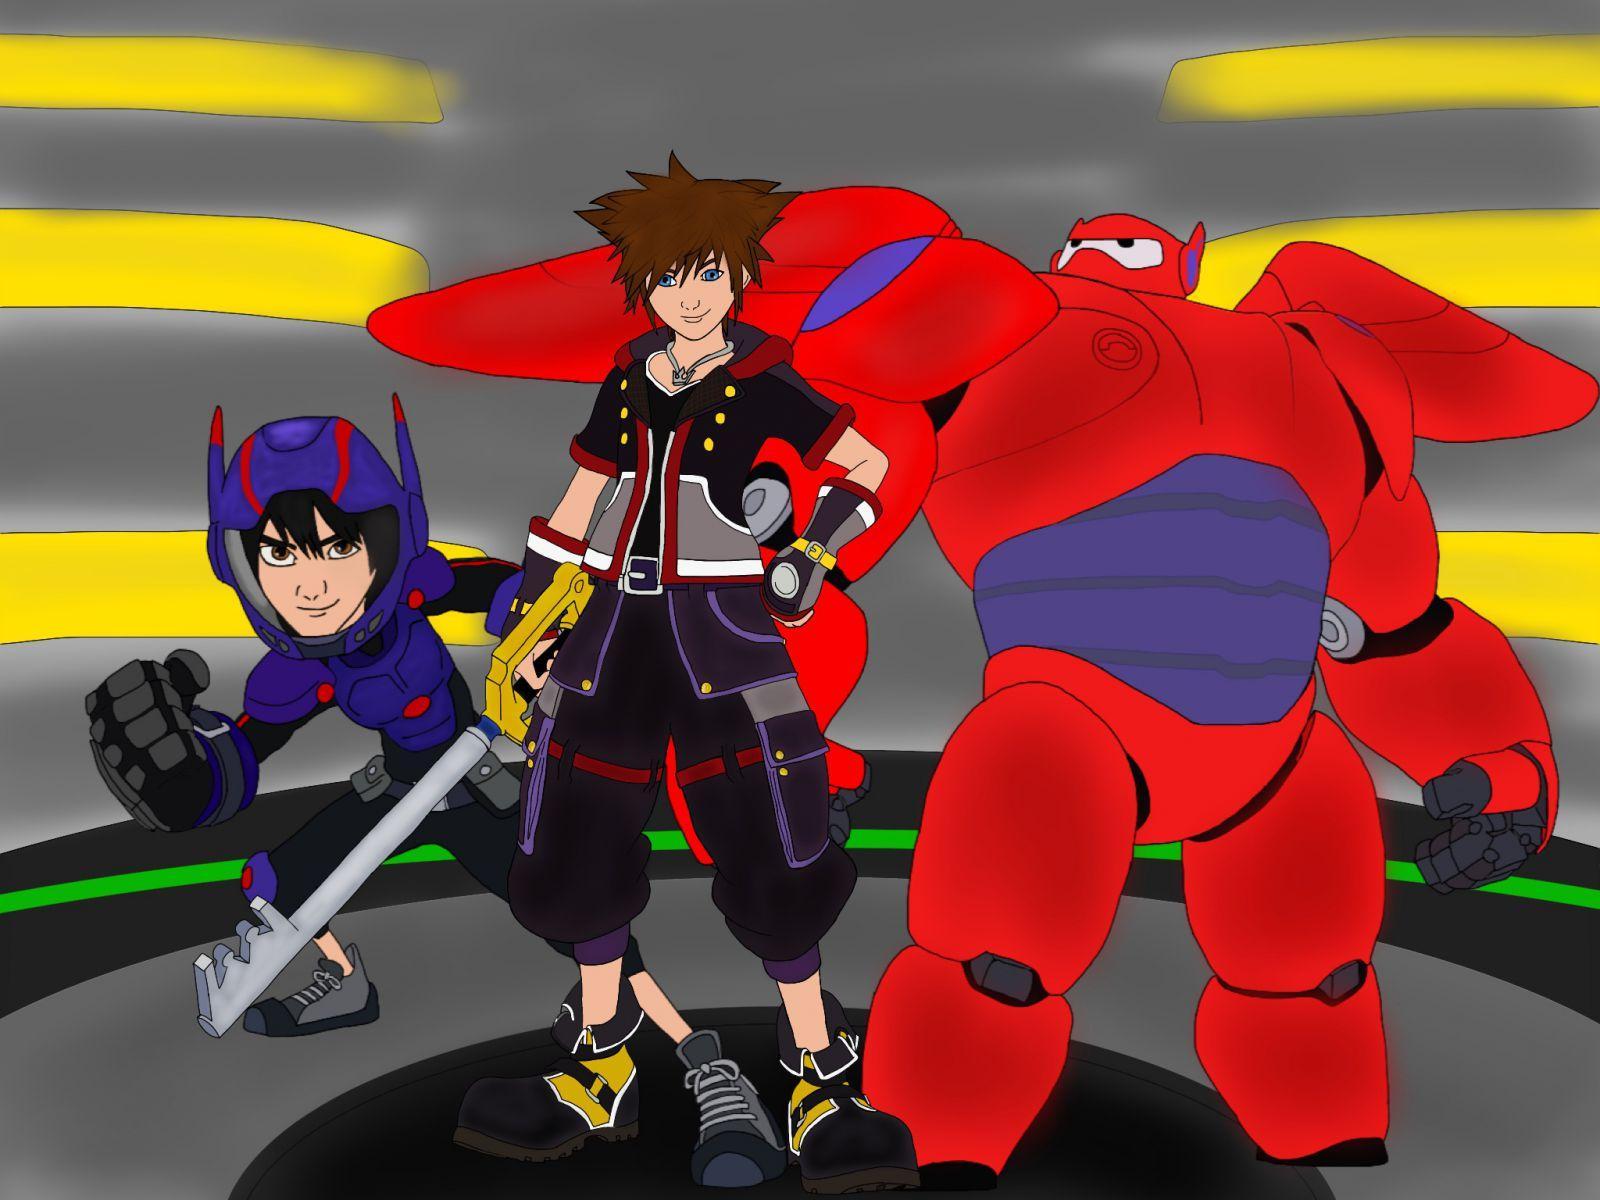 Sora in Big Hero 6